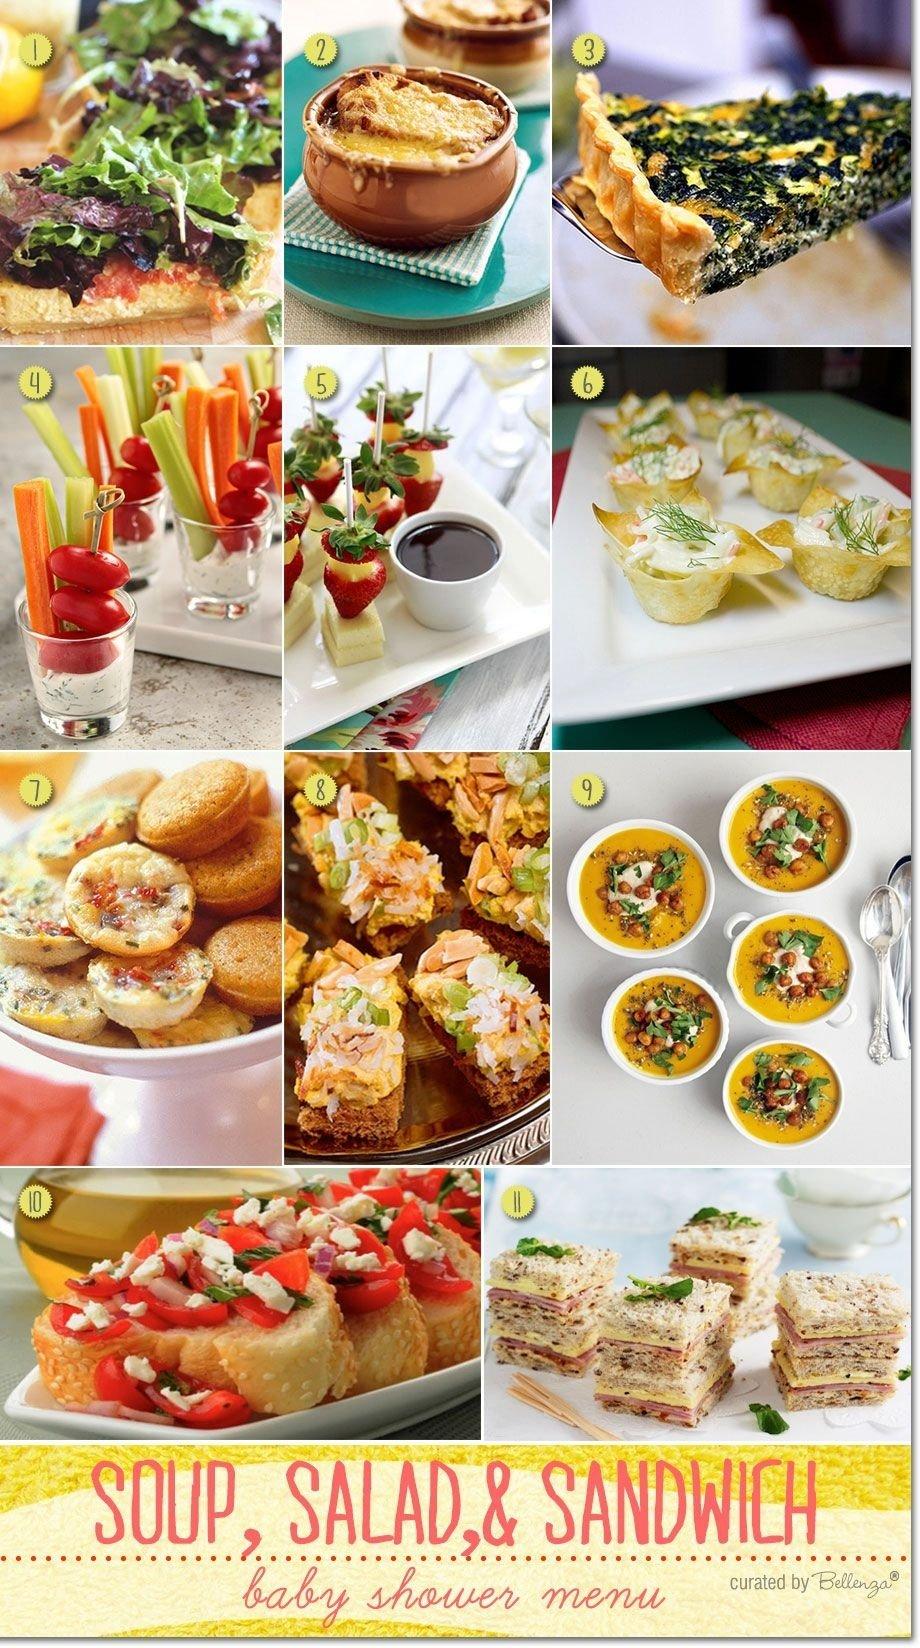 10 Gorgeous Brunch Menu Ideas For Baby Shower simple baby shower menu ideas baby shower menu simple baby shower 3 2020